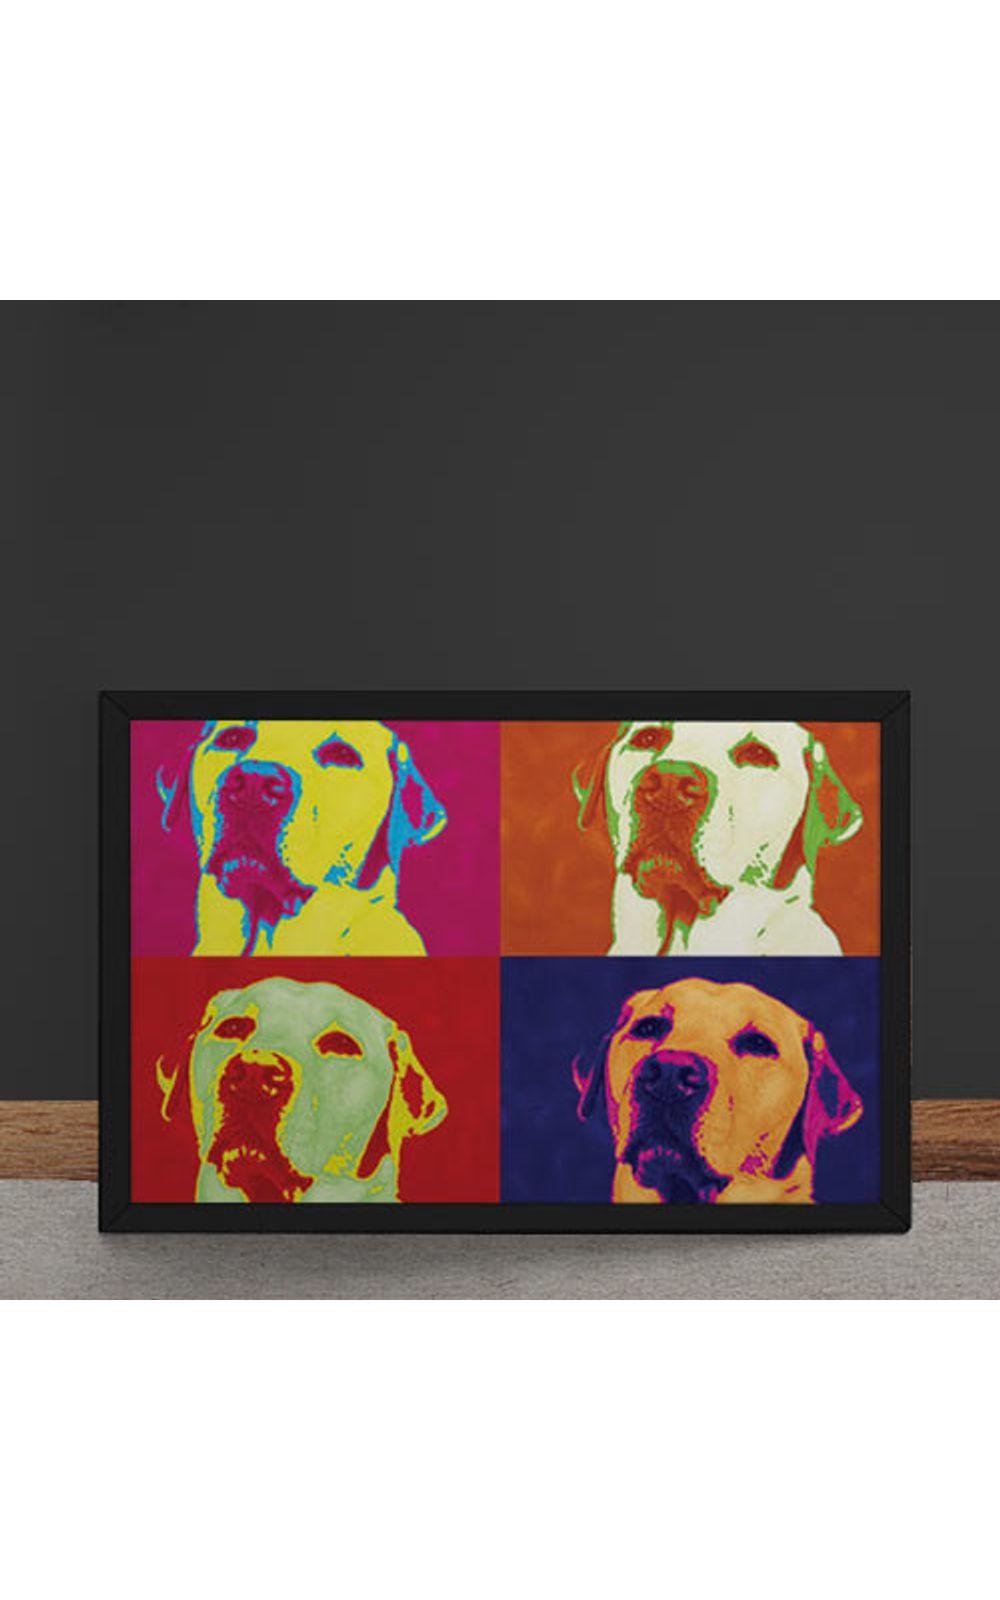 Foto 4 - Quadro Decorativo Andy Warhol Pop Art Cachorro Labrador